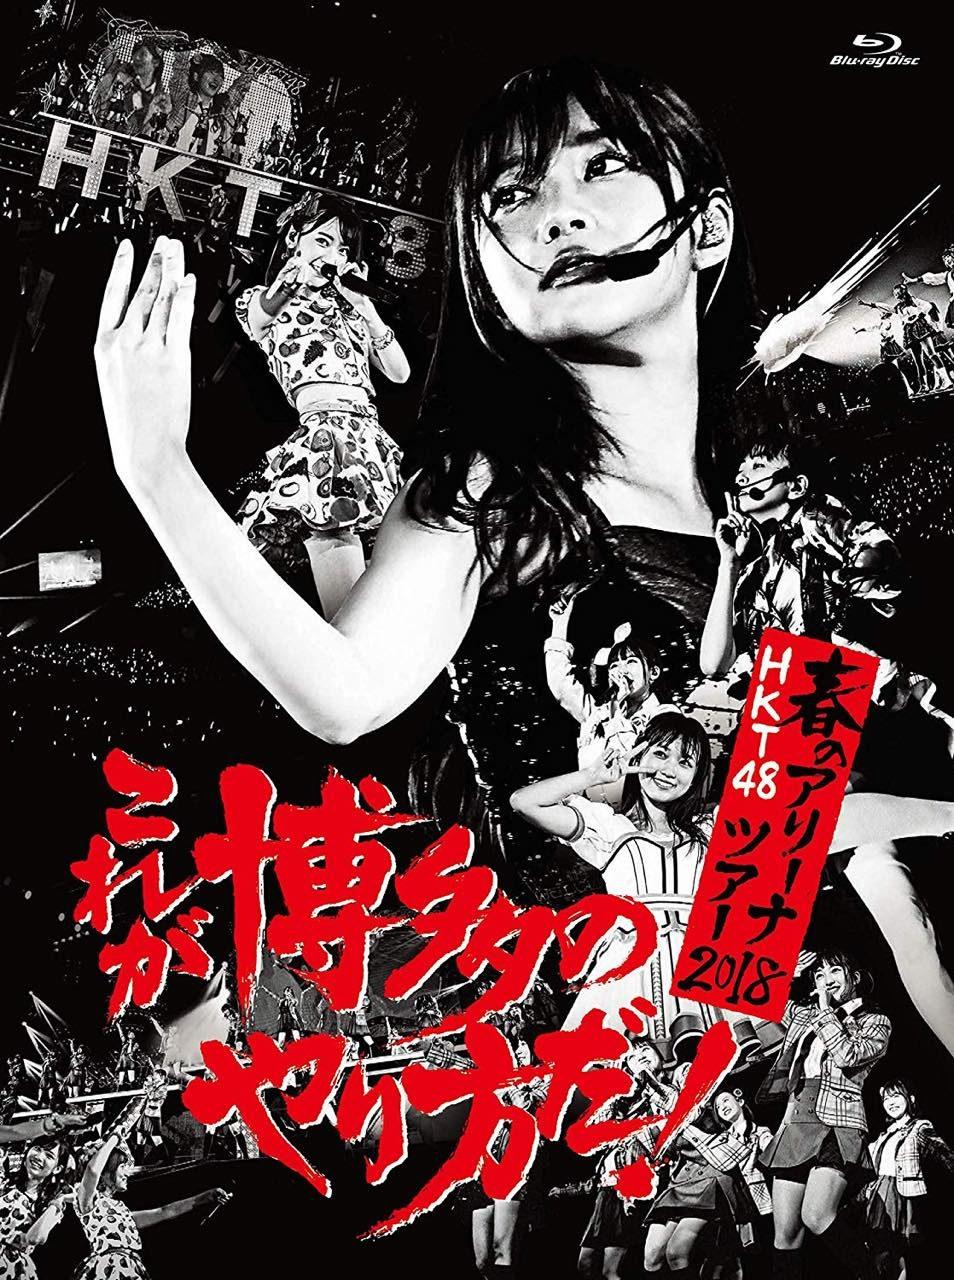 HKT48春のアリーナツアー2018 〜これが博多のやり方だ!〜 [DVD][Blu-ray]